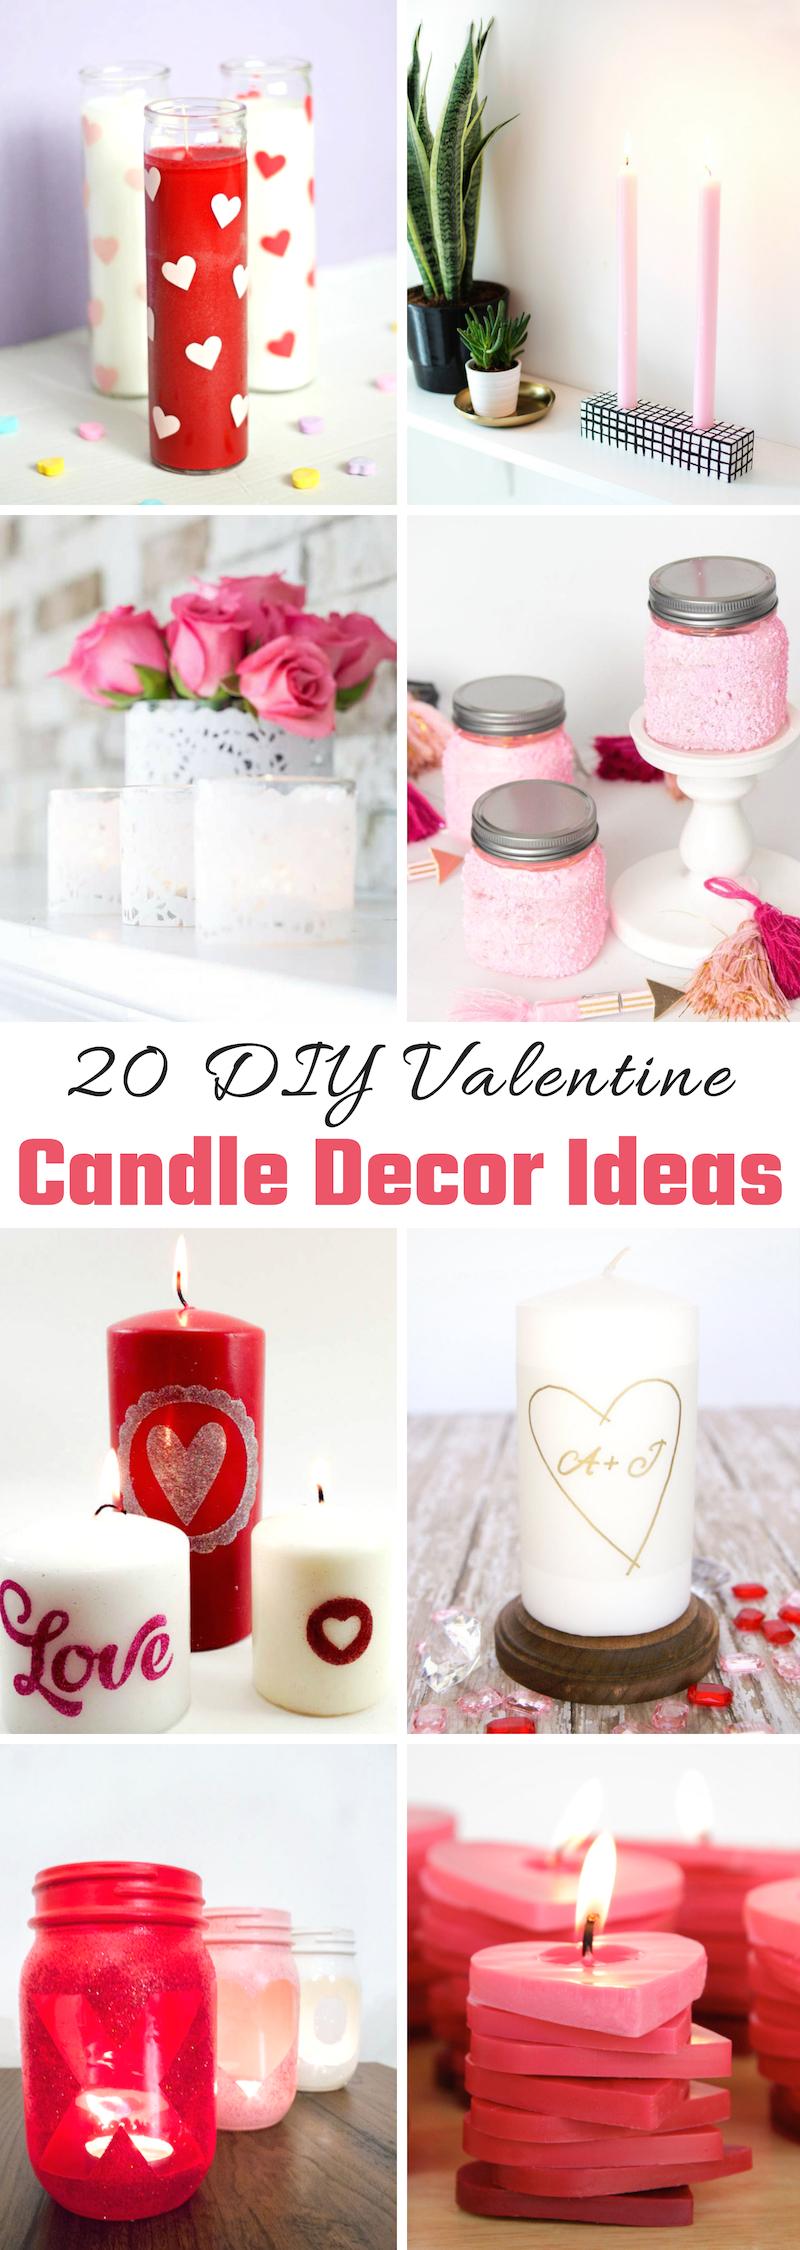 Valentine Candle Decor Ideas